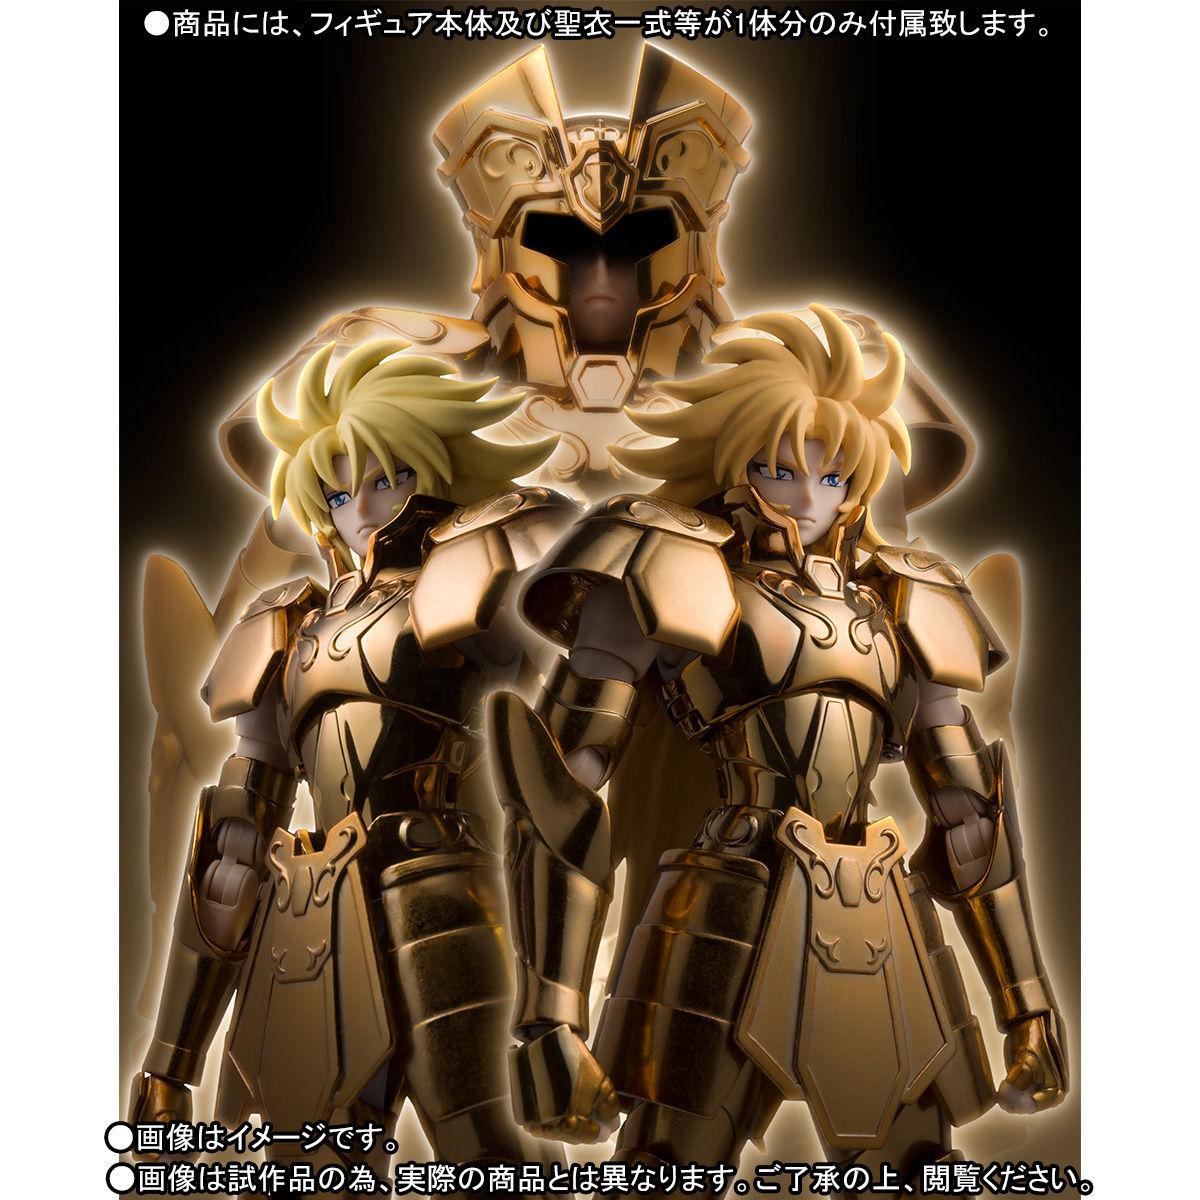 ROBOT魂 〈SIDE MS〉『RX-78-2 ガンダム & Gファイター ver. A.N.I.M.E.~リアルタイプカラー~』可動フィギュア-015